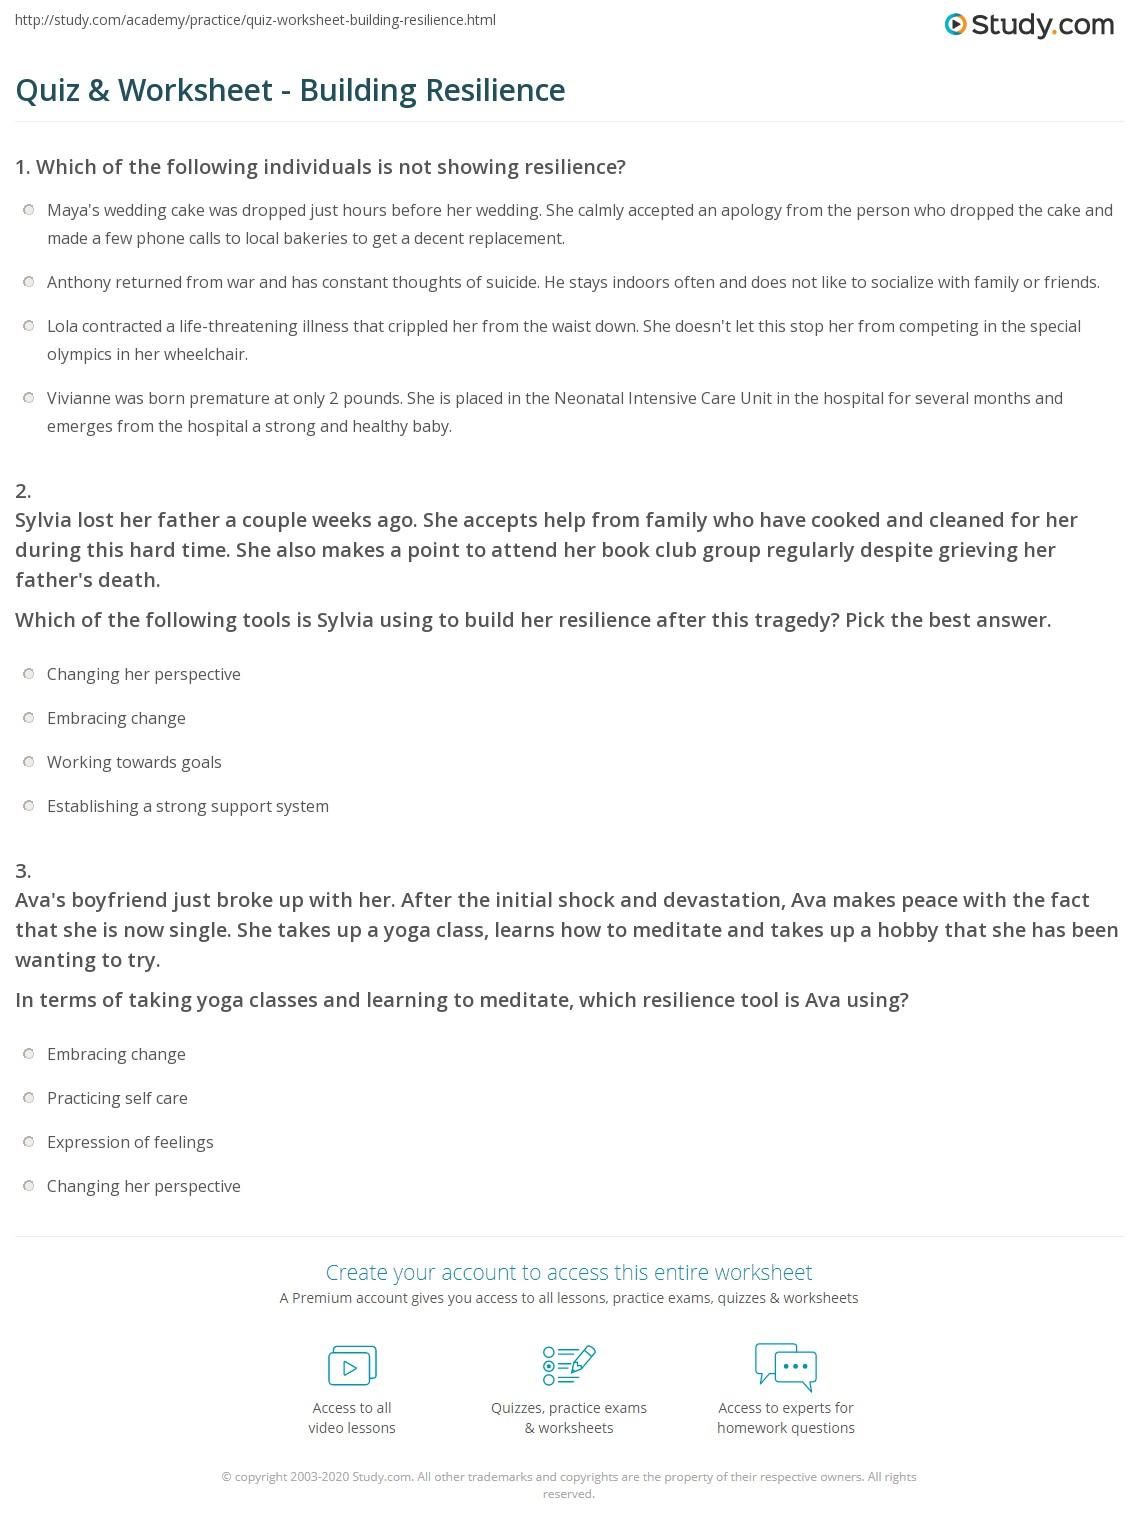 Quiz & Worksheet - Building Resilience | Study.com